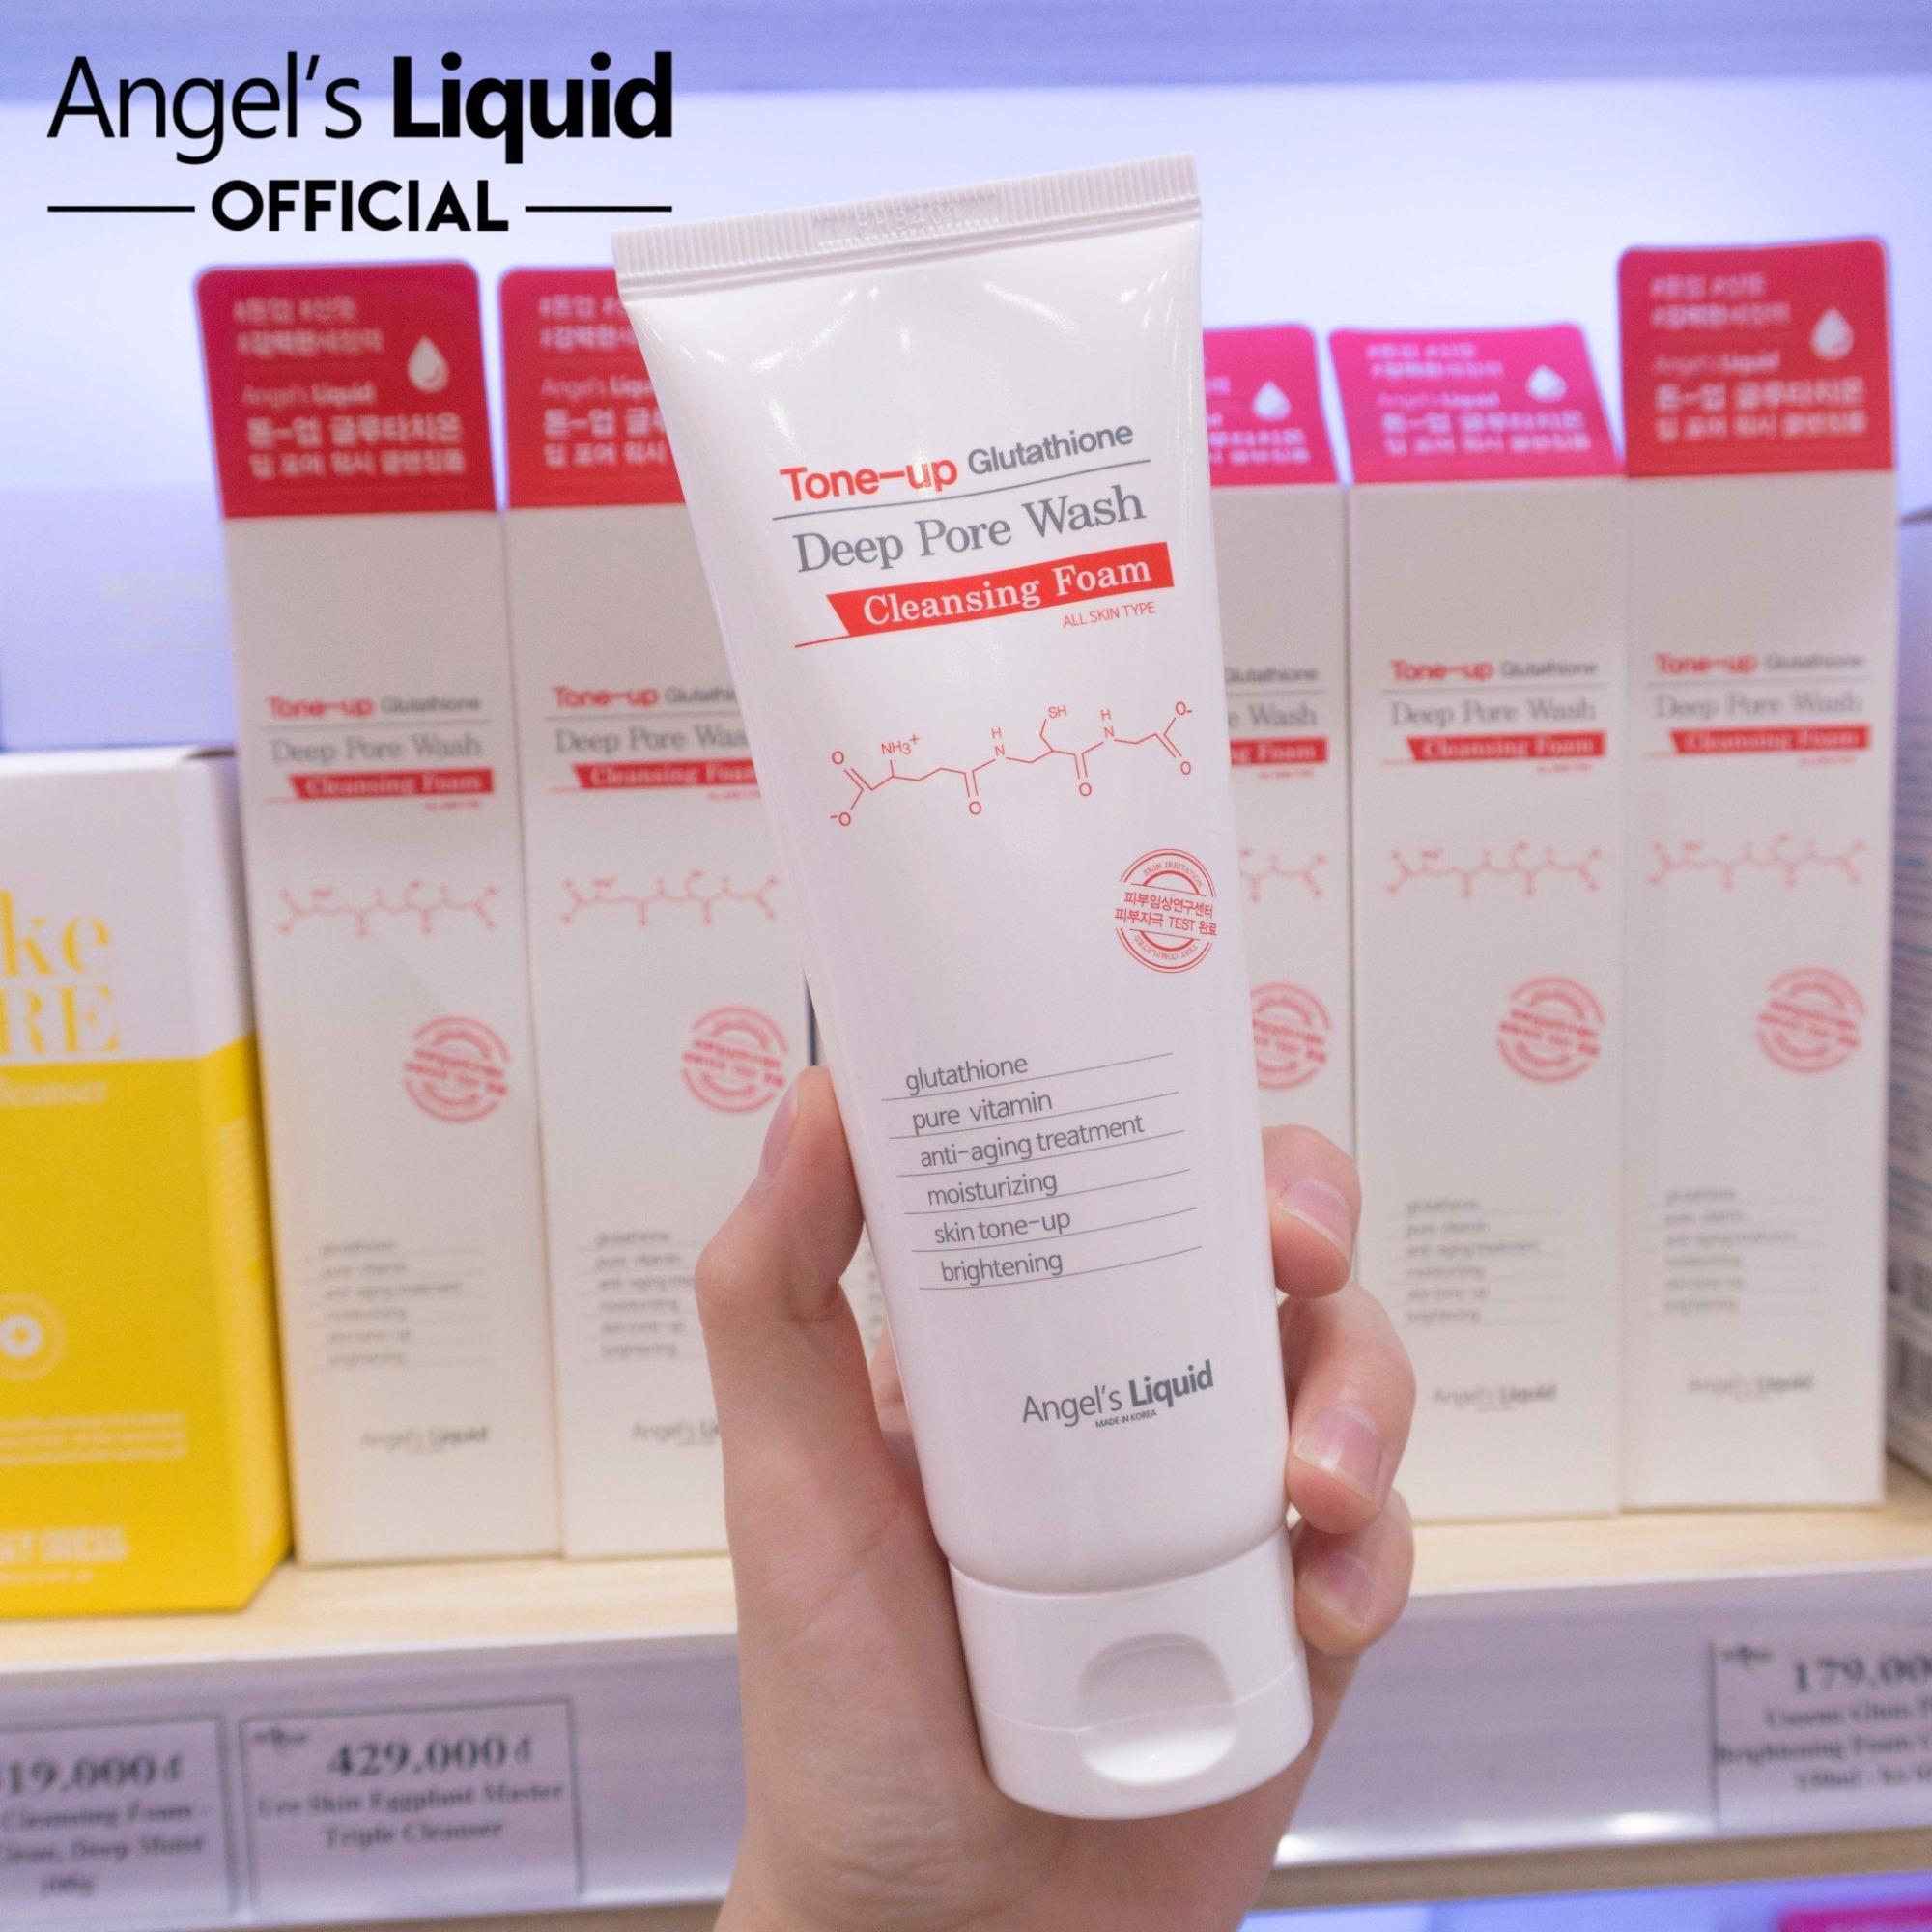 Sữa Rửa Mặt Angel's Liquid Tone Up Glutathione Deep Pore Wash 120ml